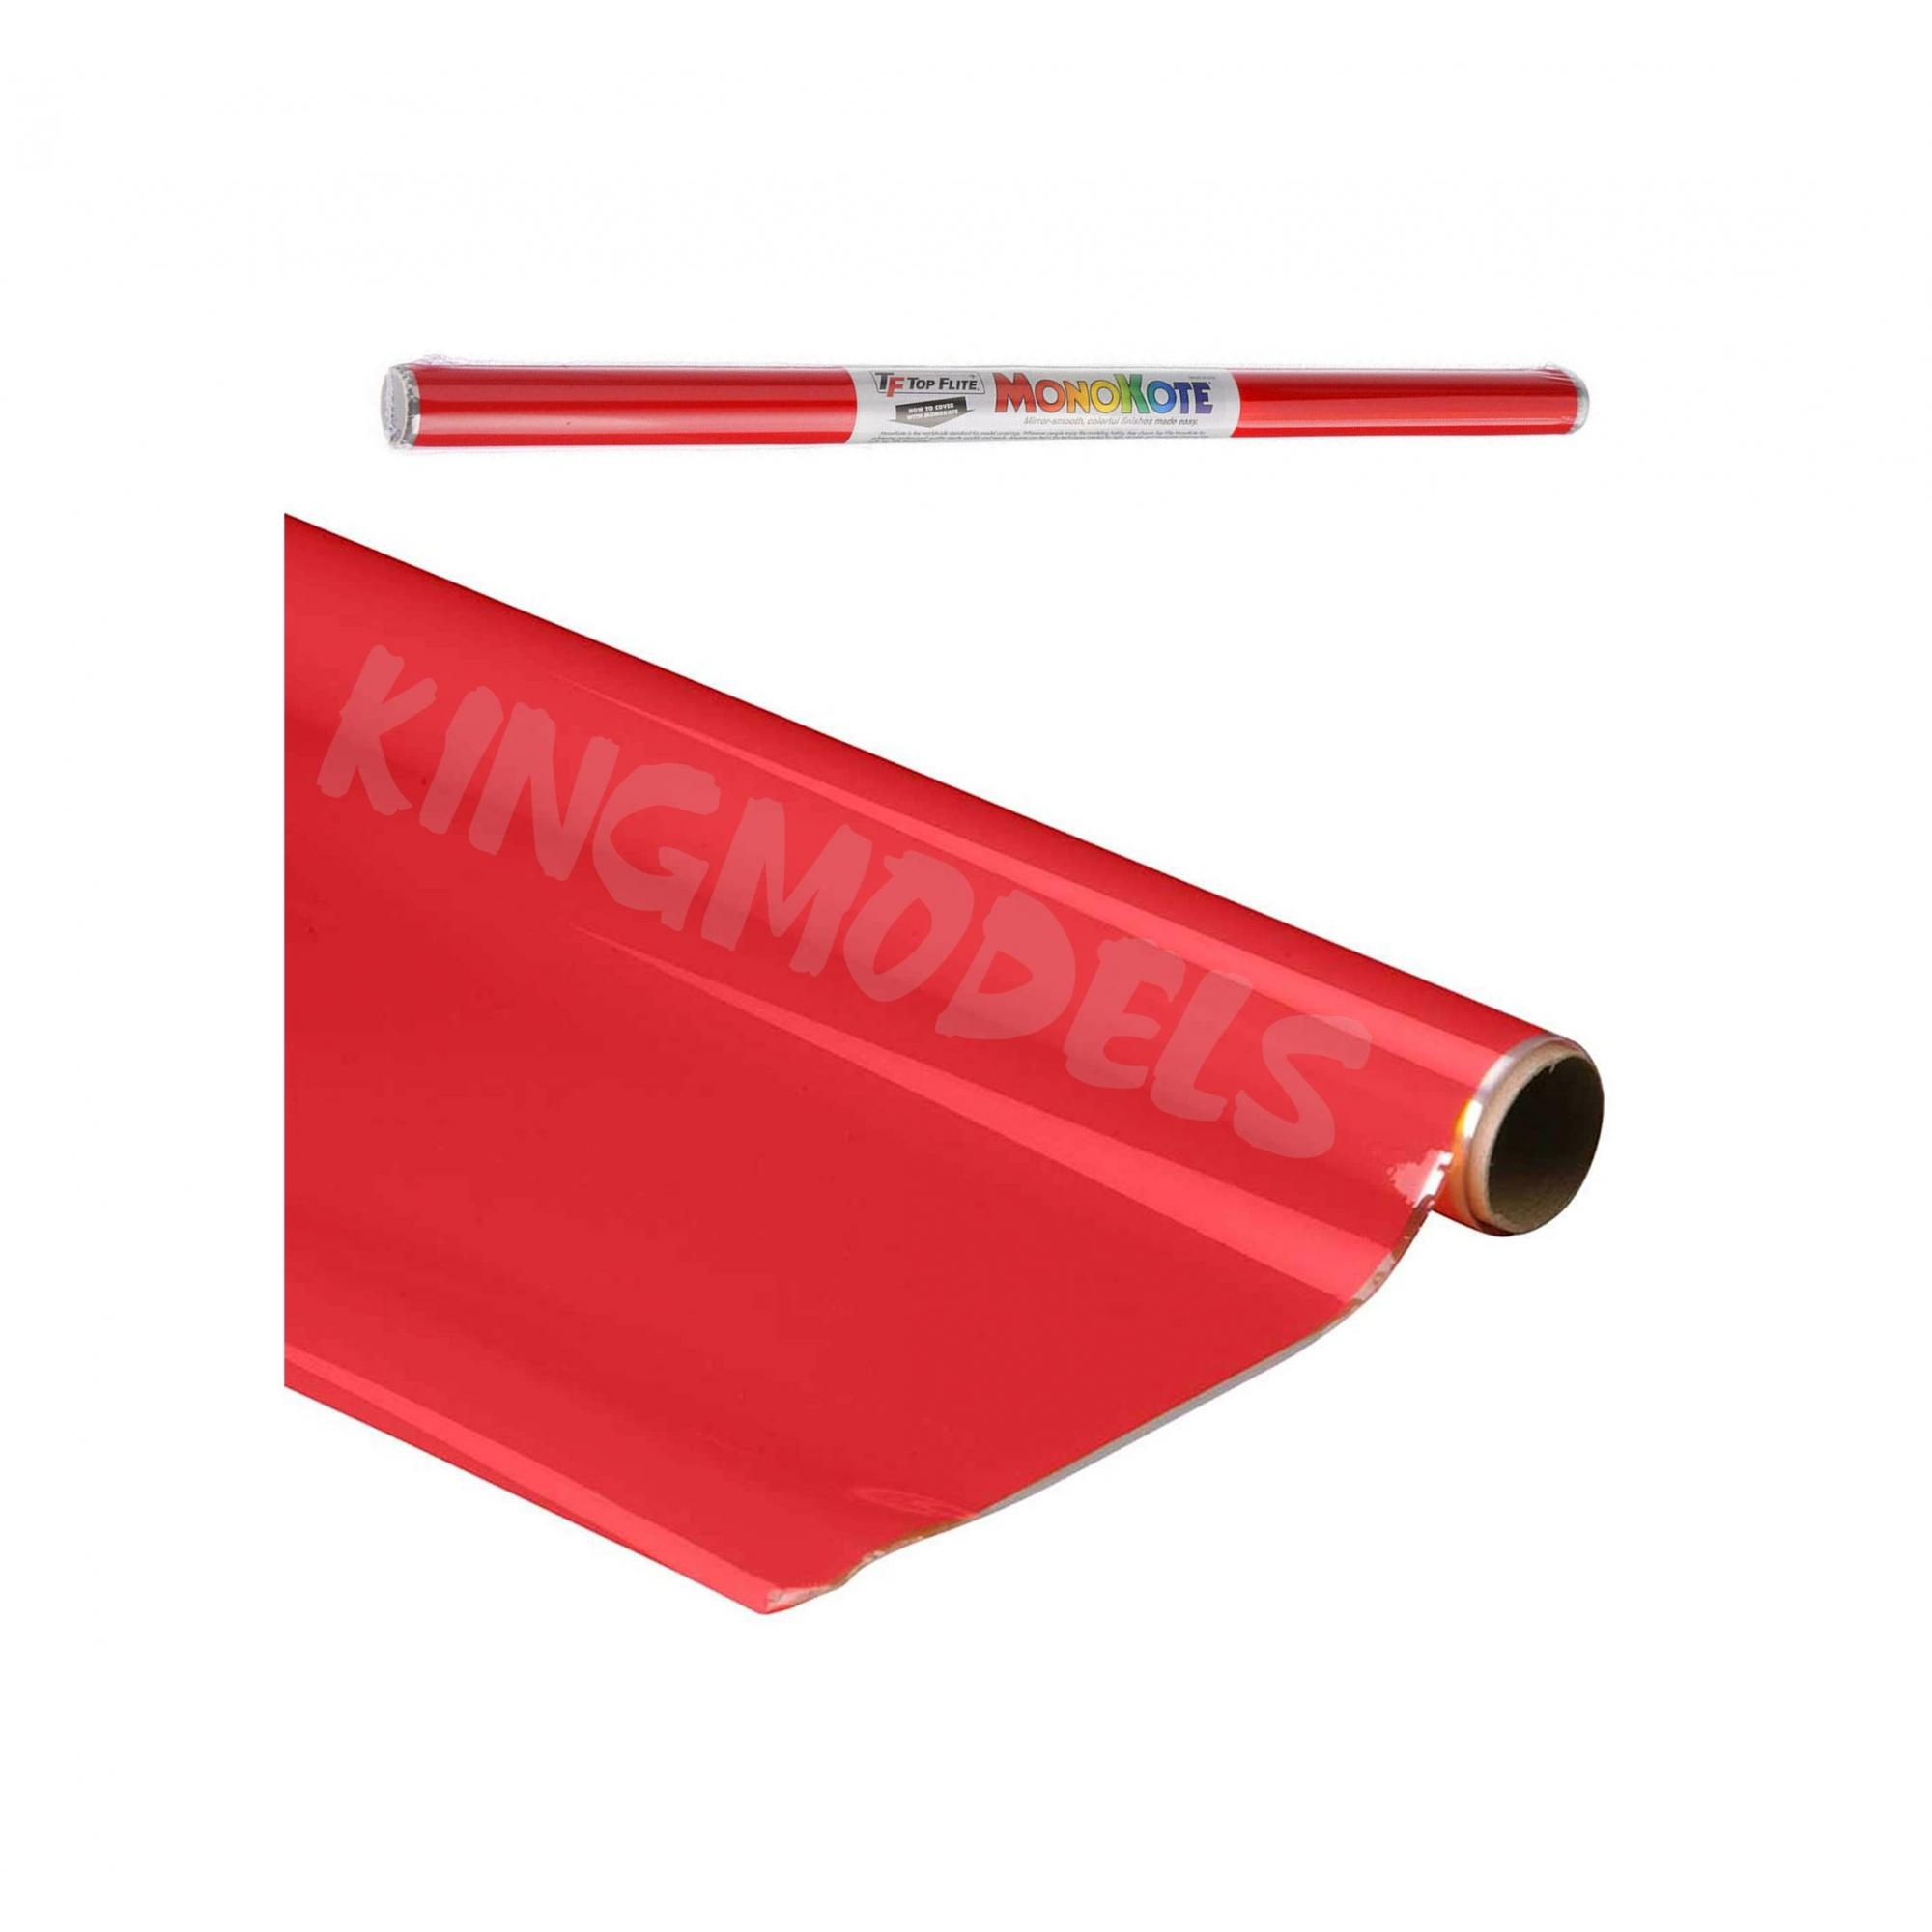 Monokote Topflite(genuino) - Vermelho(missile Red)- Topq0201  - King Models